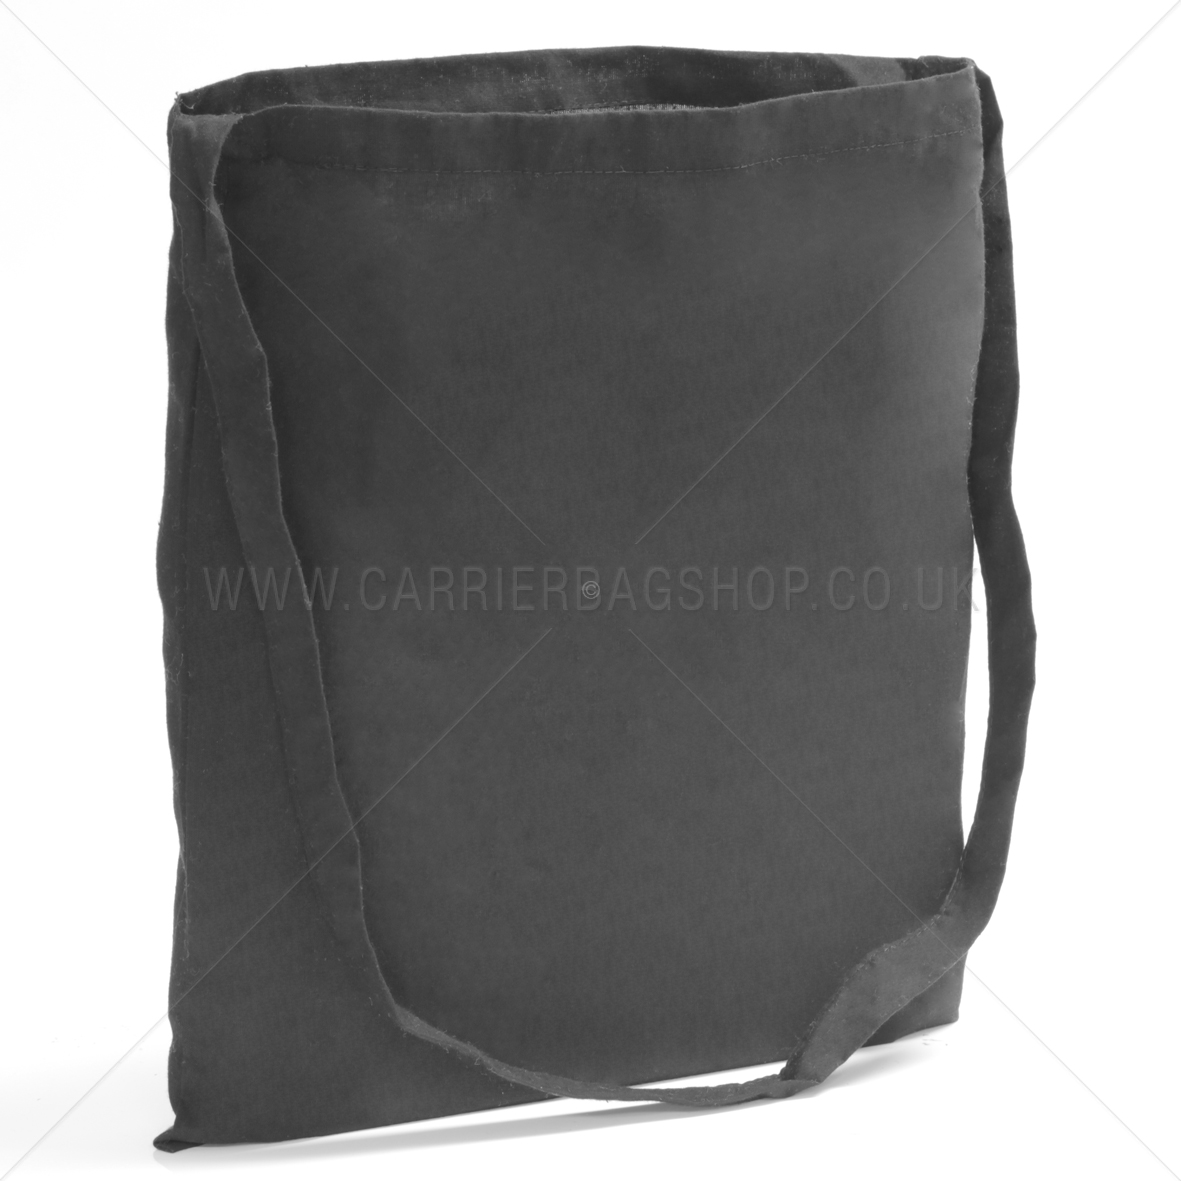 Black Coloured Cotton Sling Tote Bag From Carrier Bag Shop